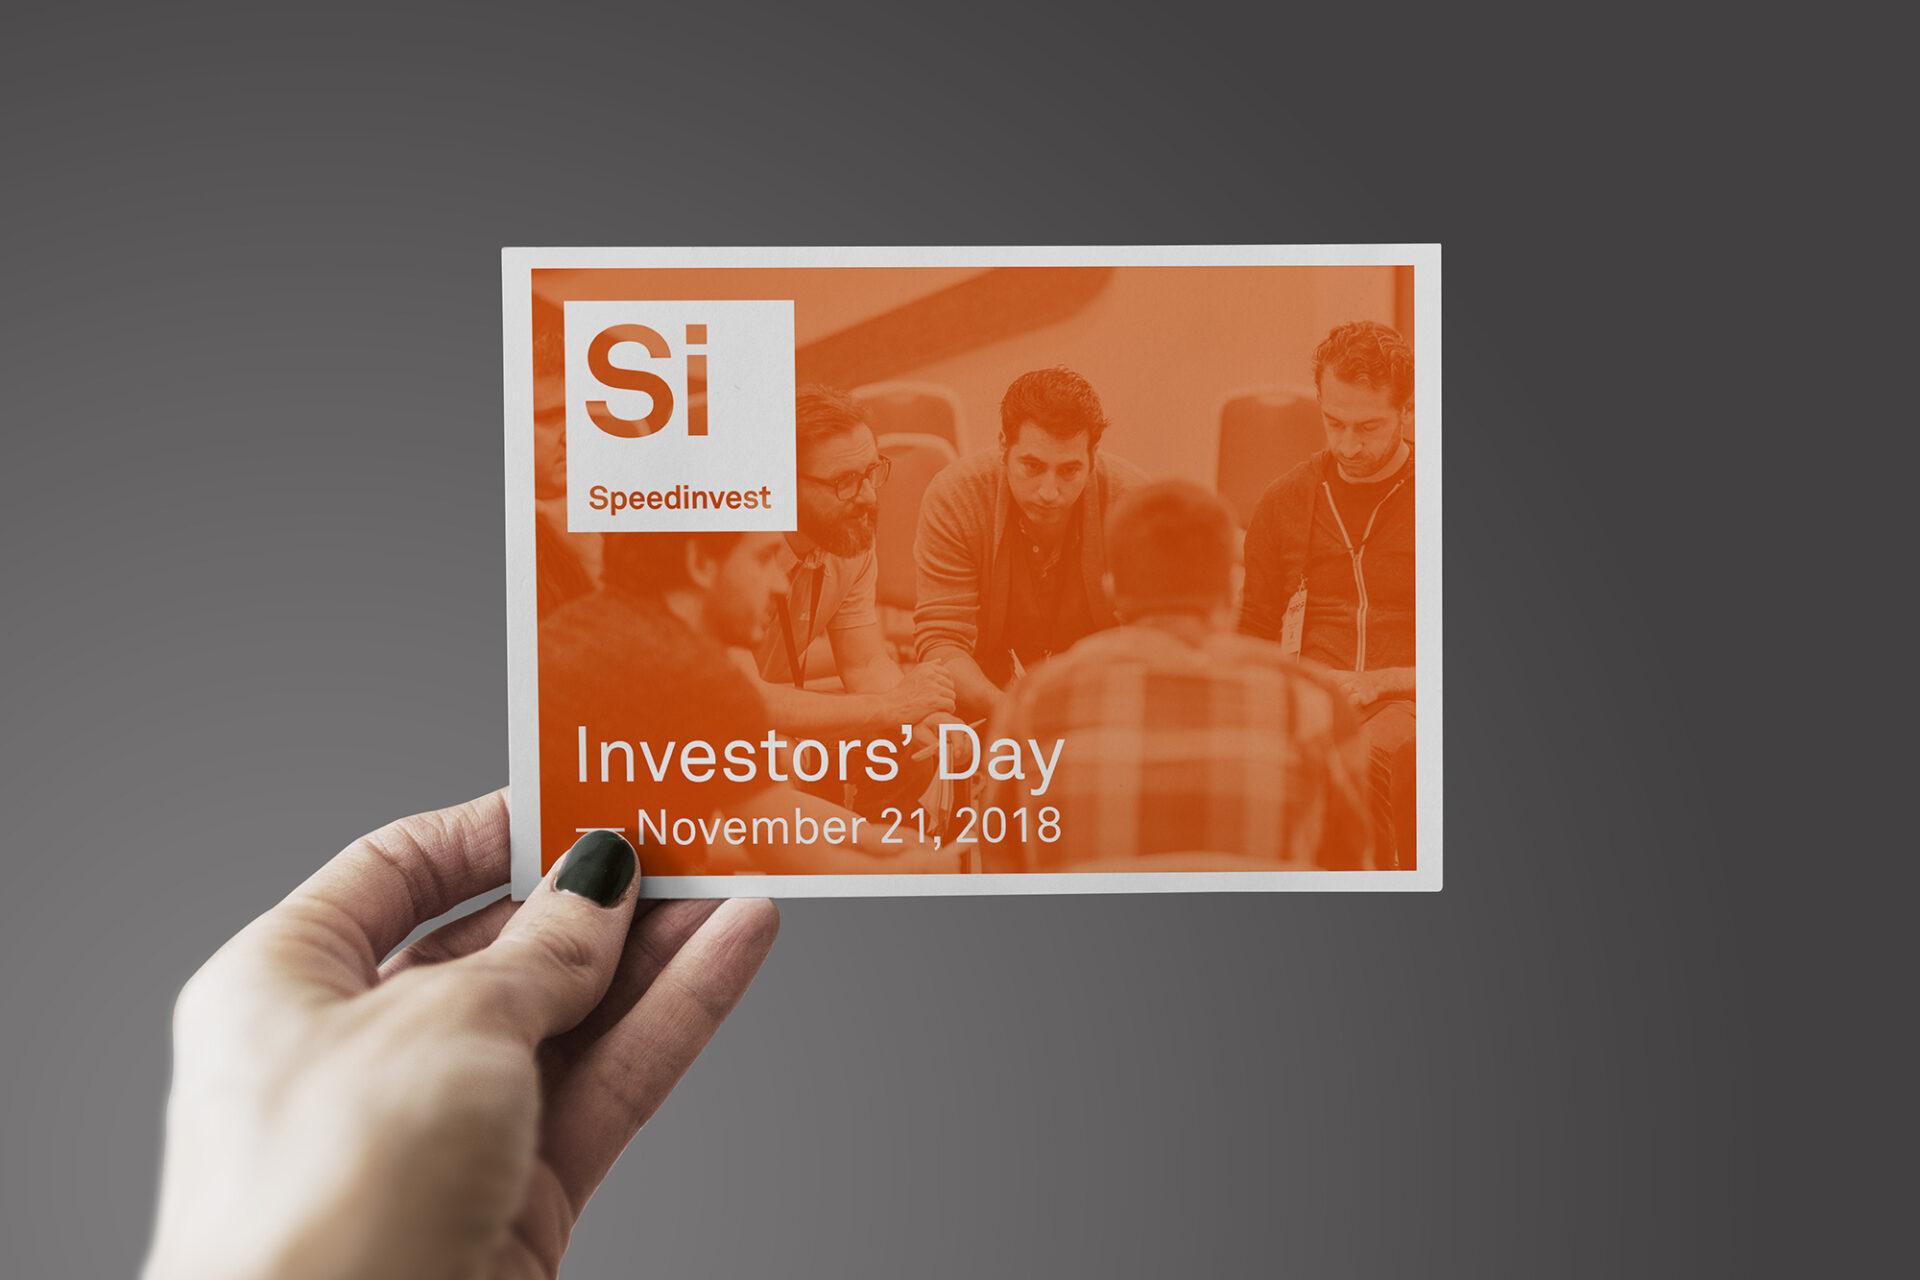 Speedinvest Investorsday 2018 Programm Cover